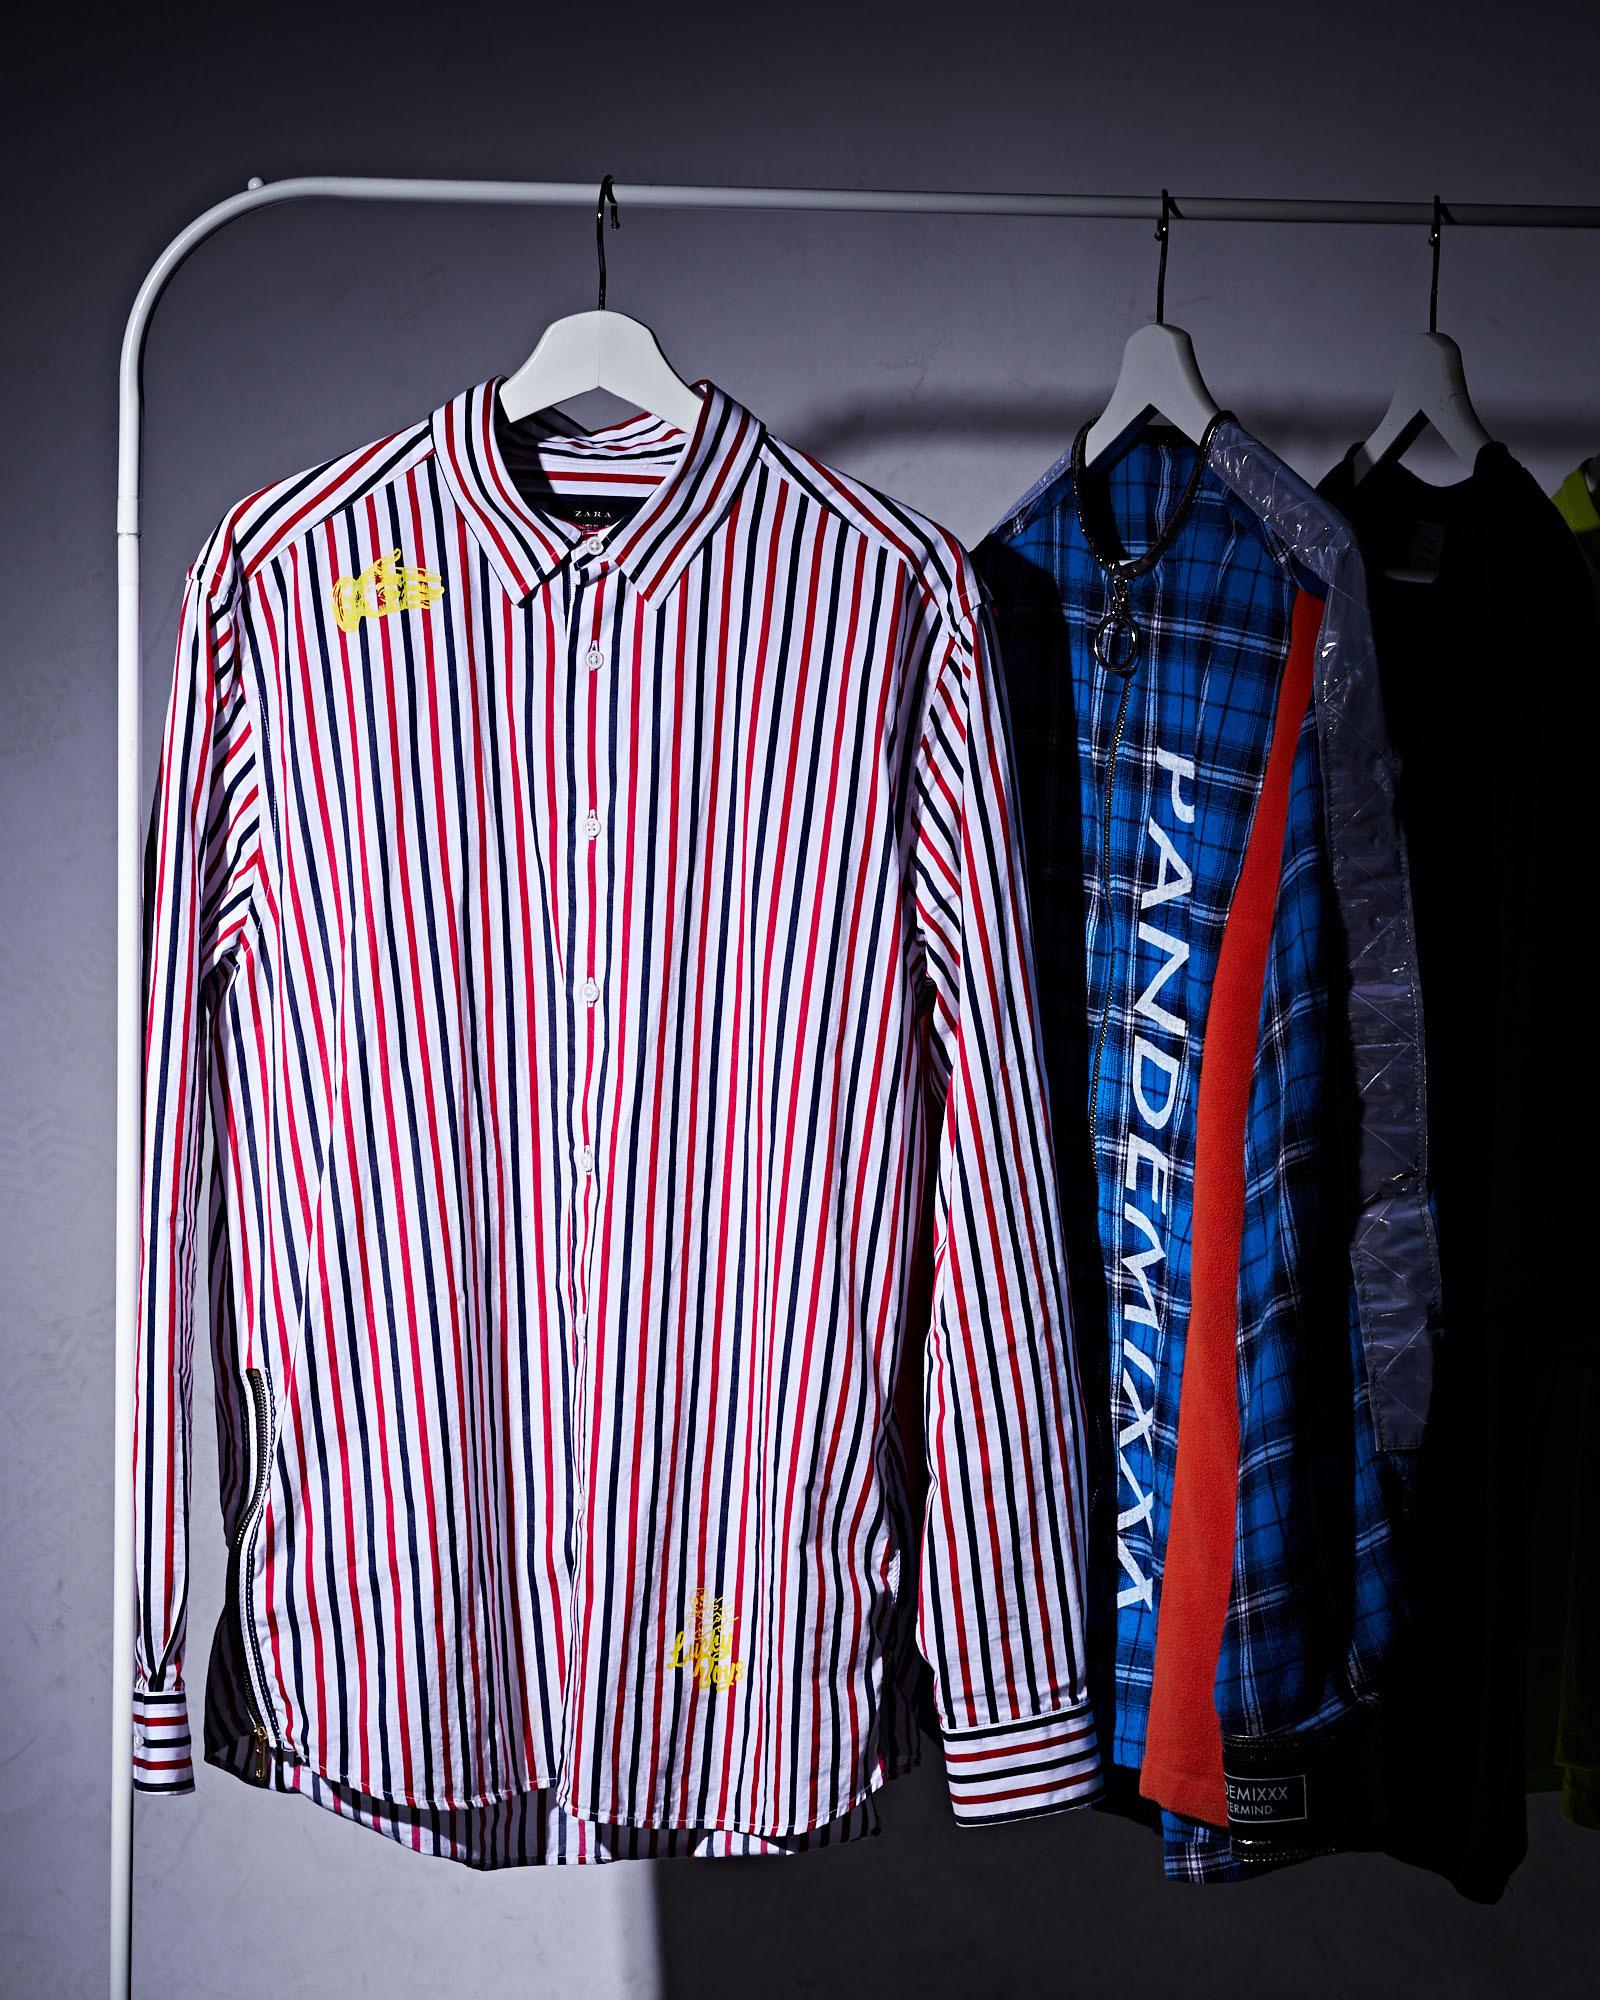 Printed striped shirt